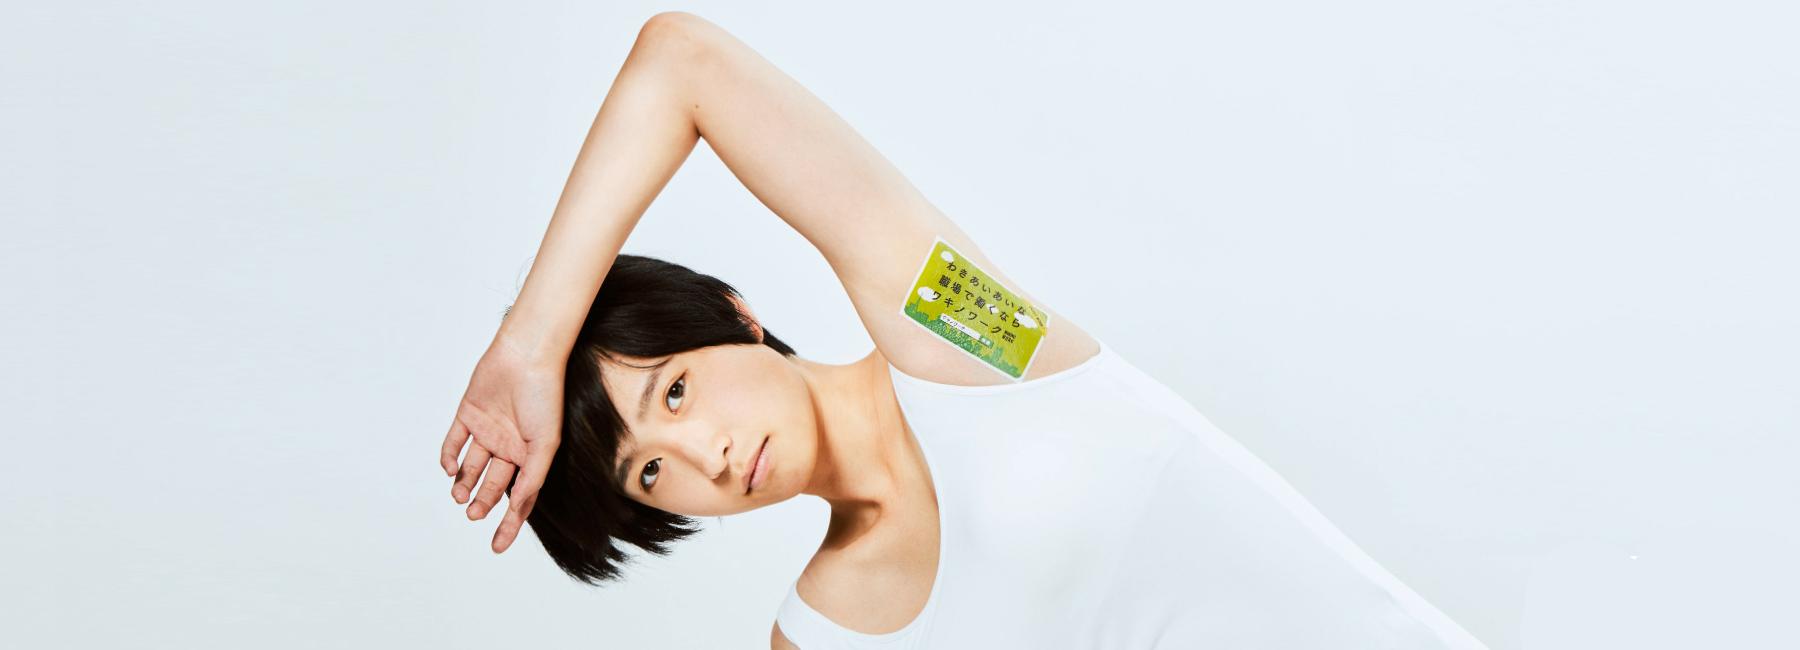 japanese-company-wakino-armpit-ads-designboom-1800